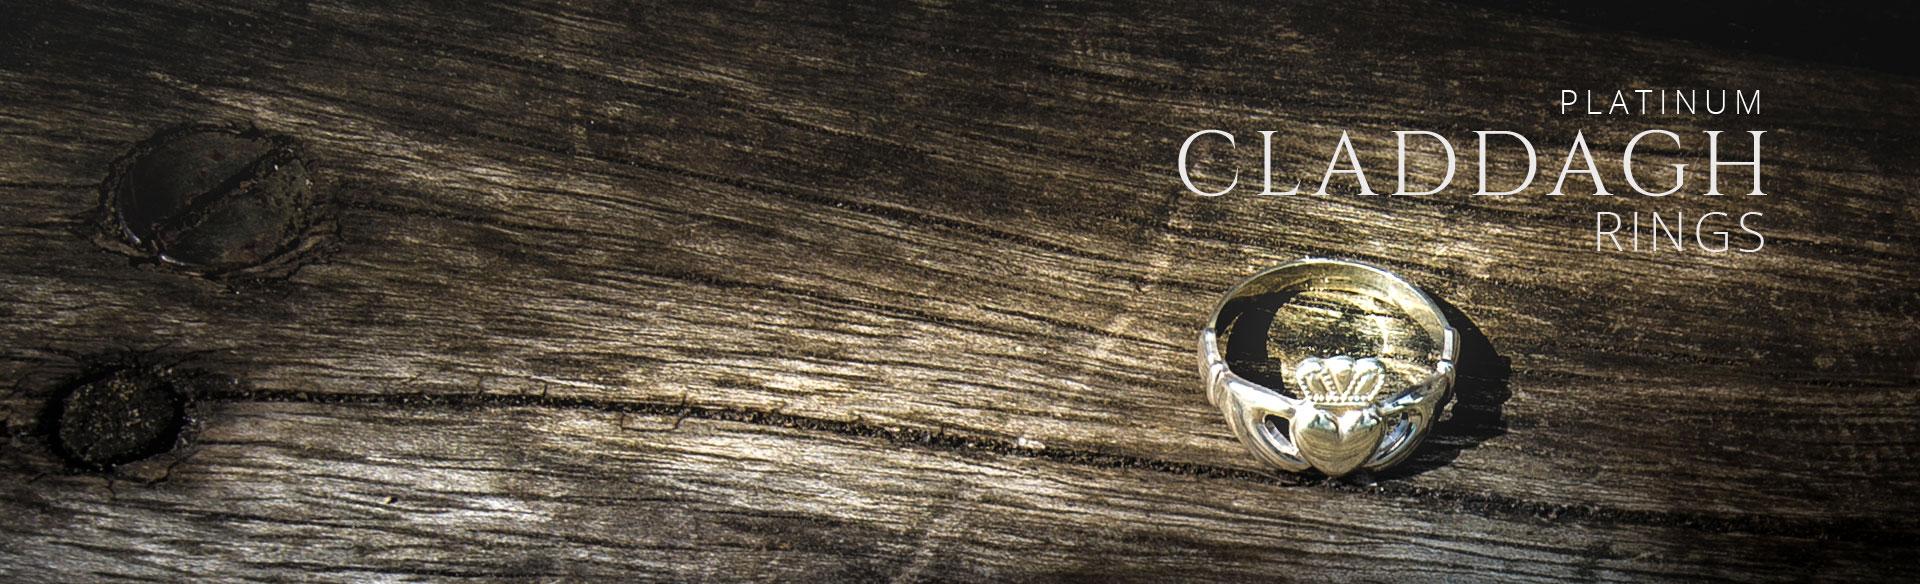 Platinum Claddagh Rings